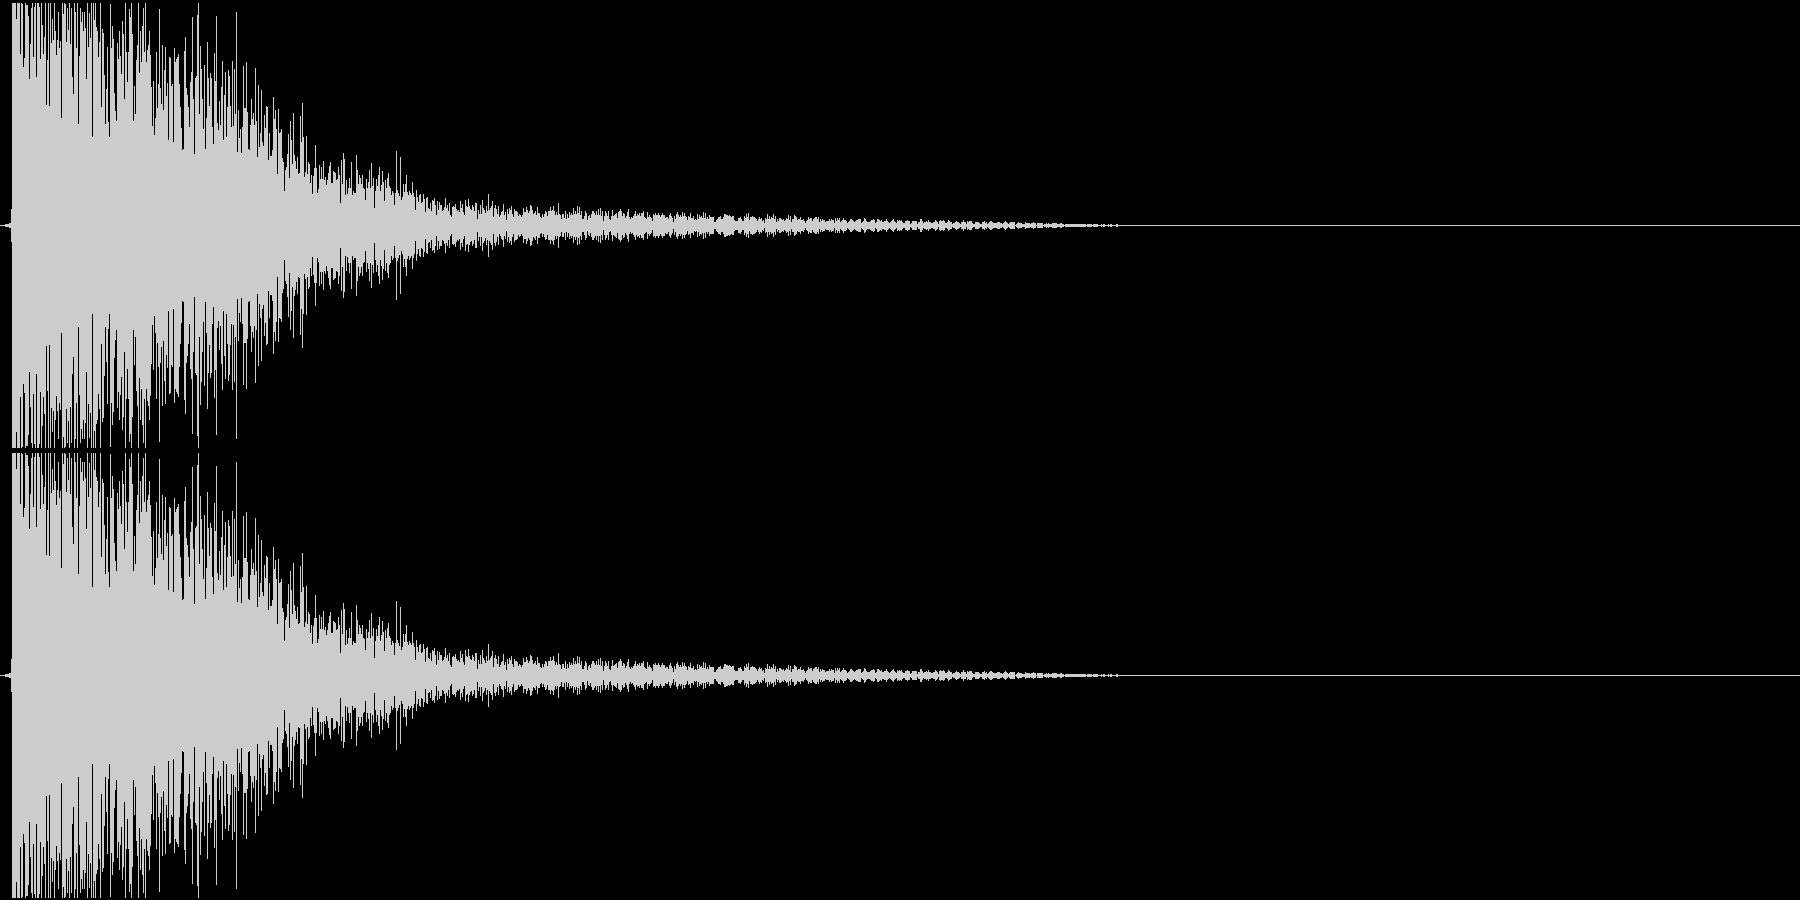 Katana 日本刀のしなやかな斬撃音の未再生の波形